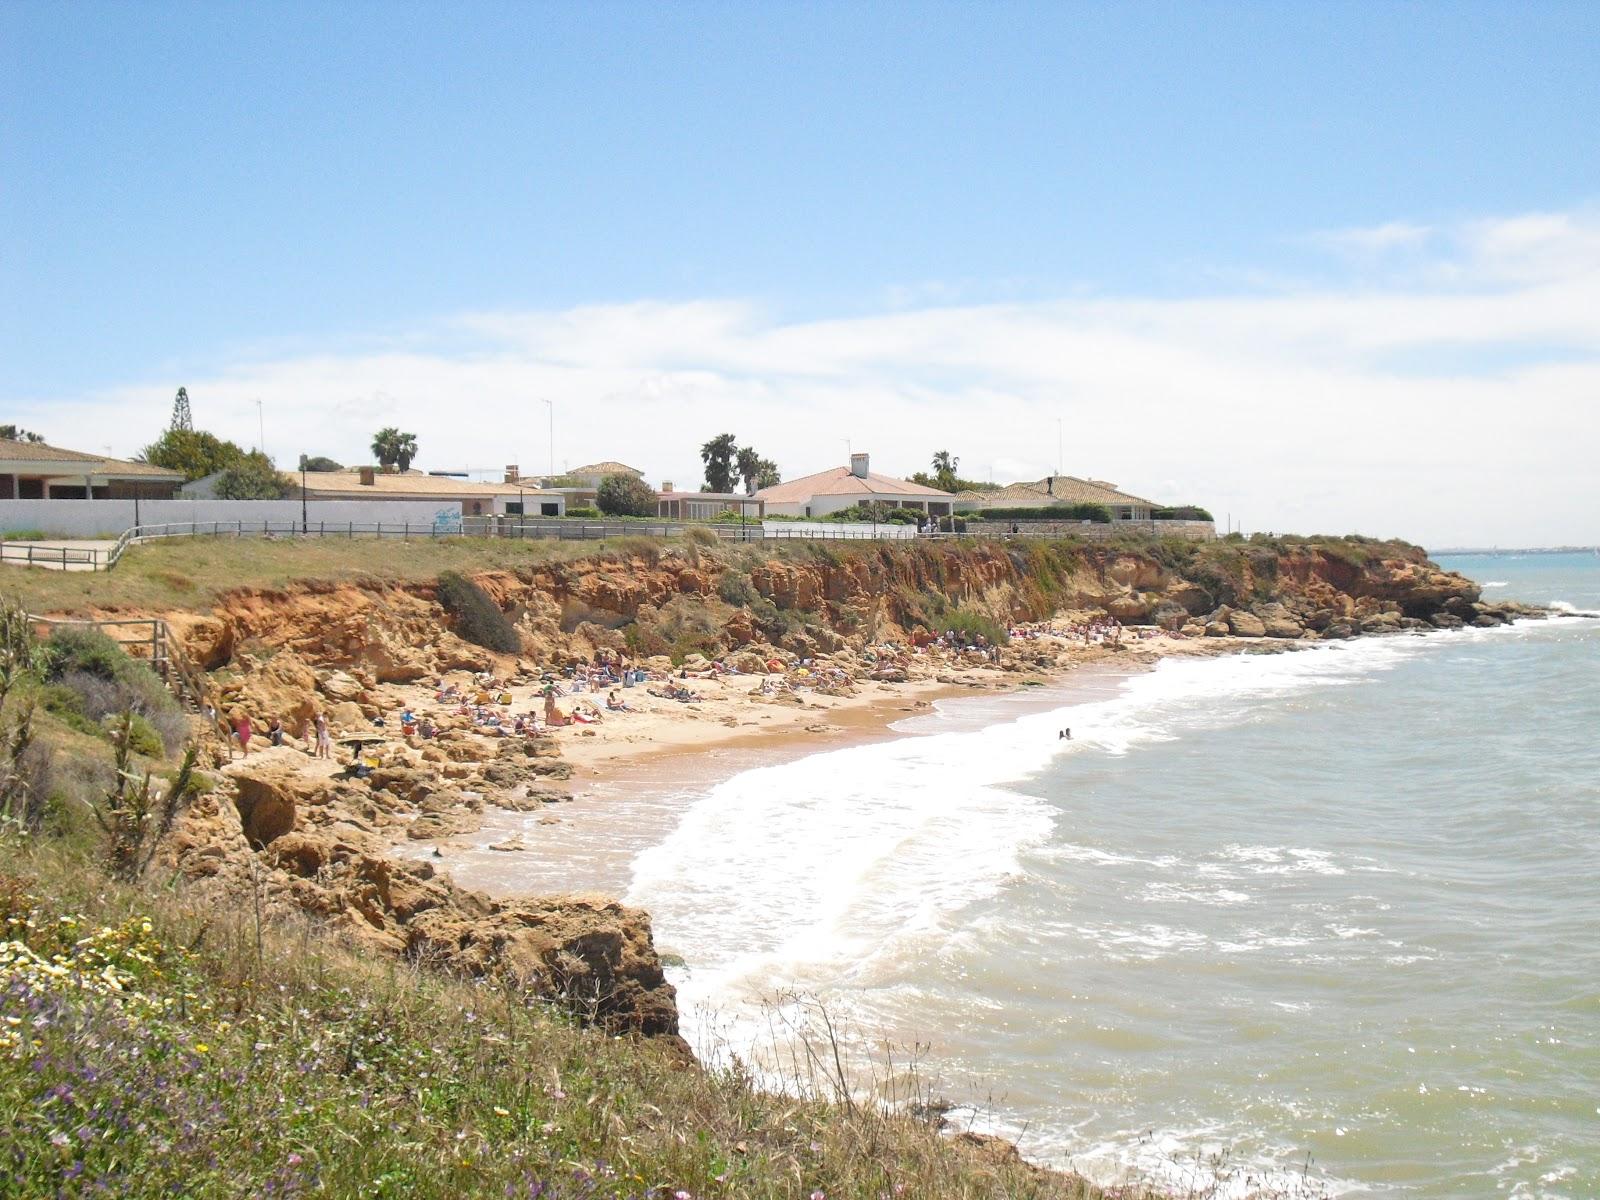 Playa La Calita